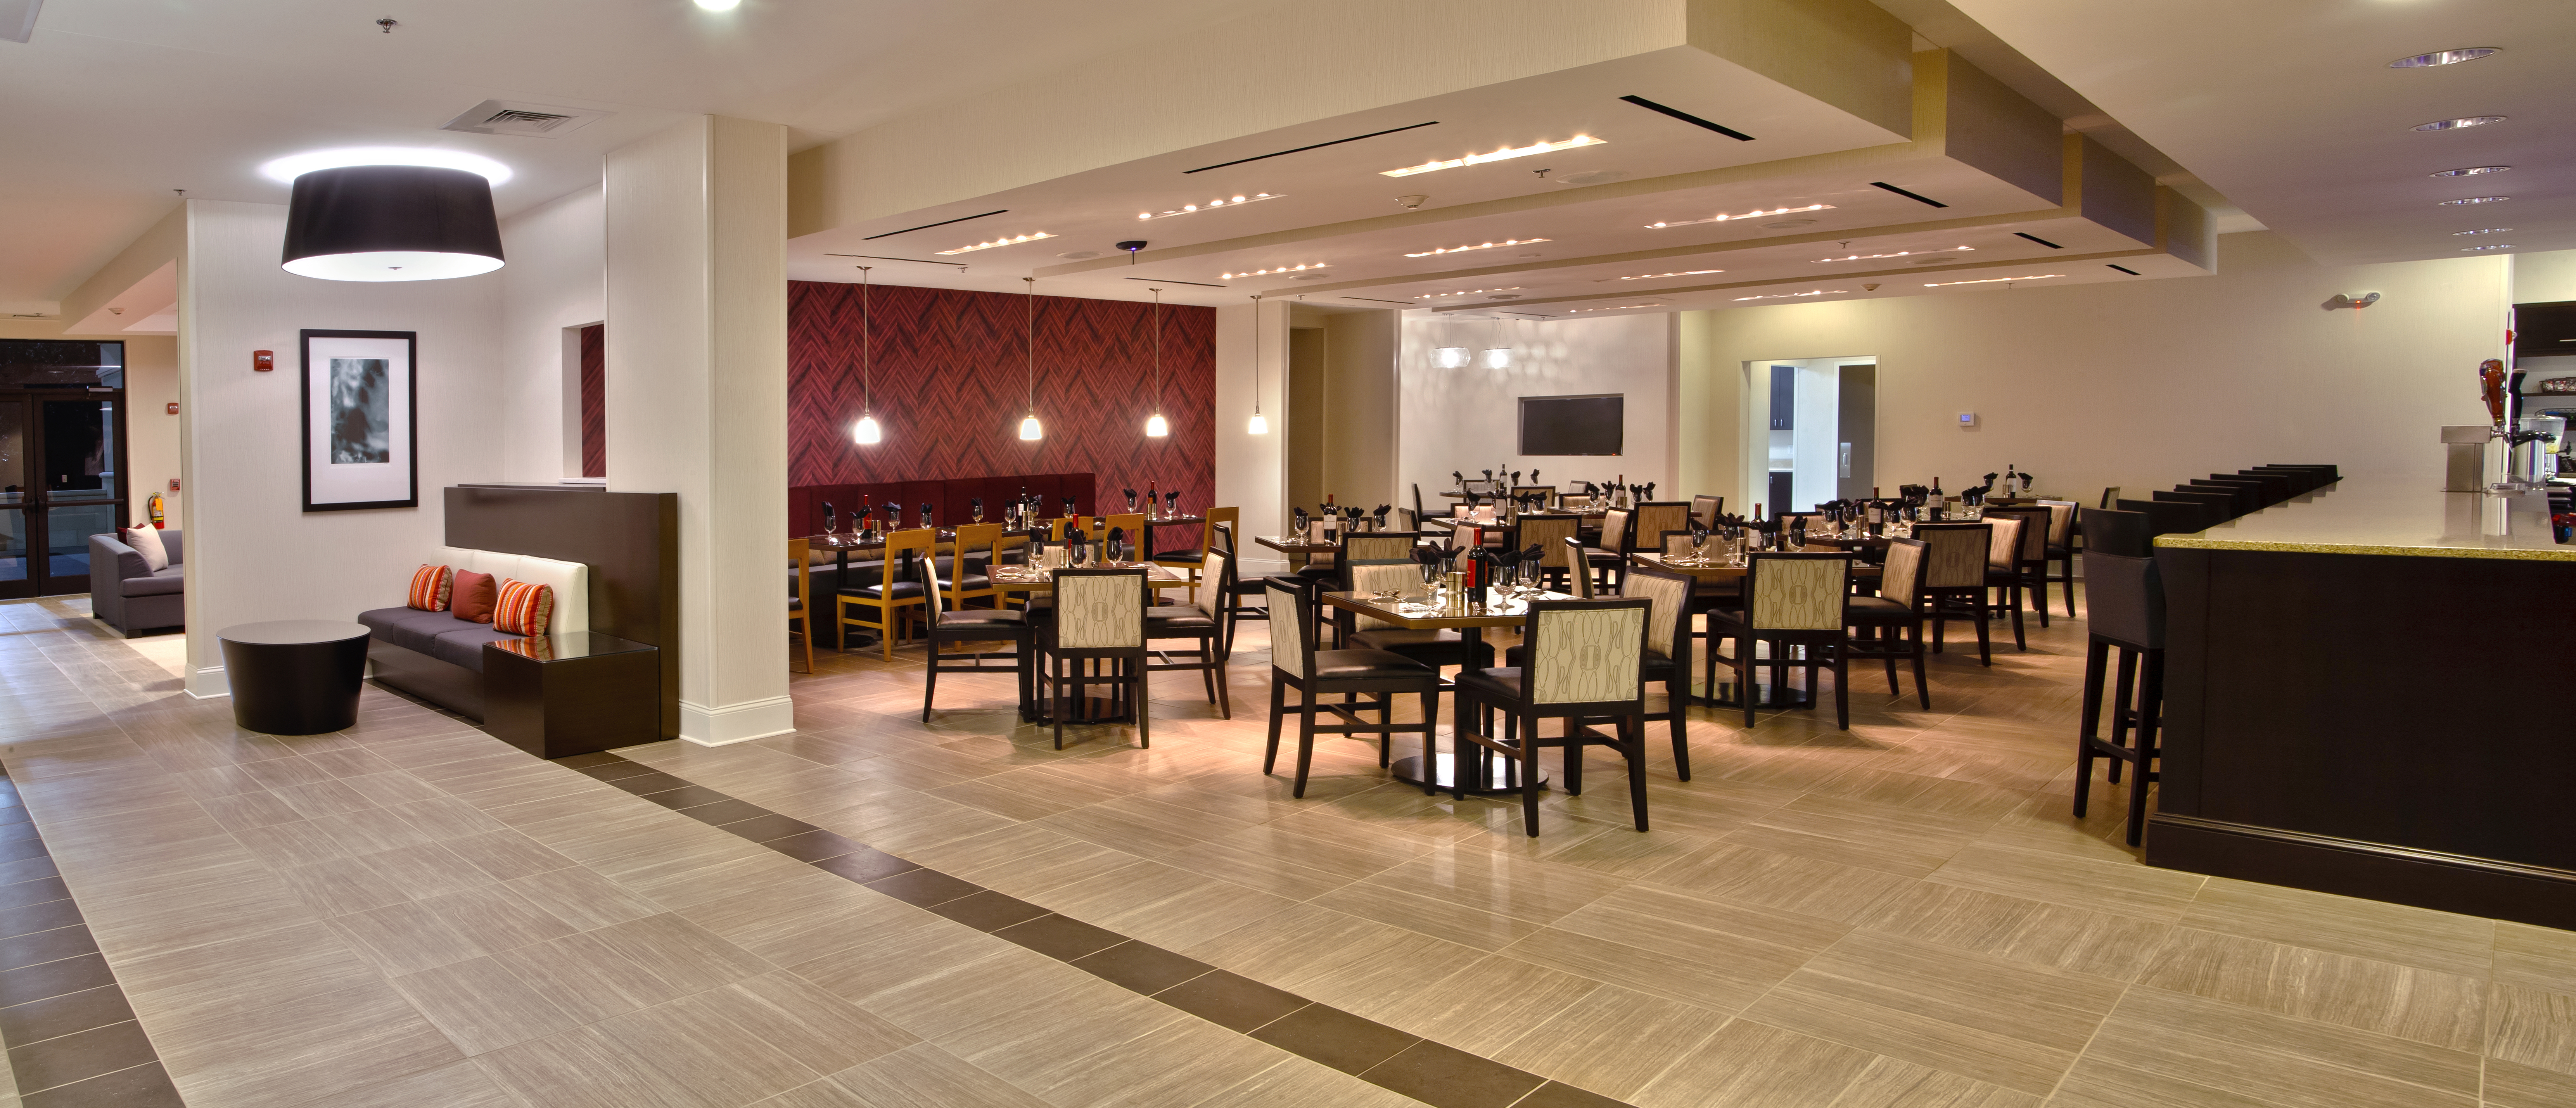 Holiday Inn Charlotte NC Airport Hotel | Charlotte Best ...